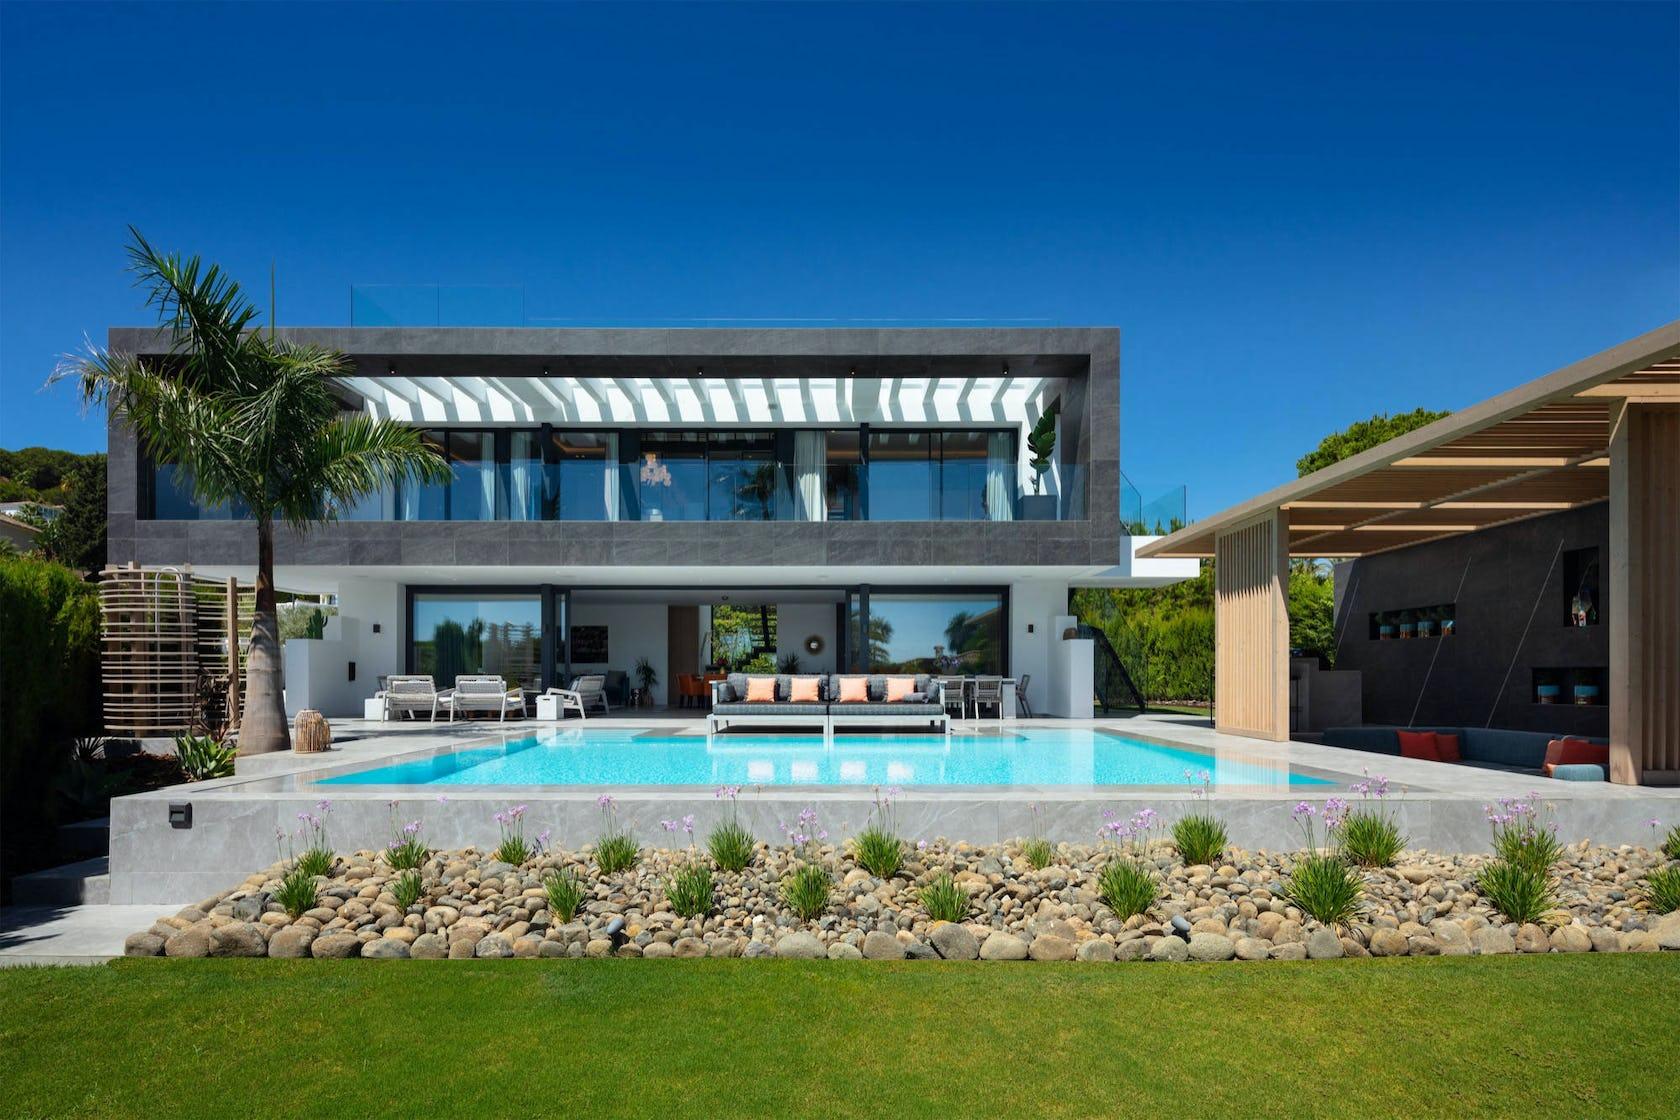 villa housing building house grass plant mansion